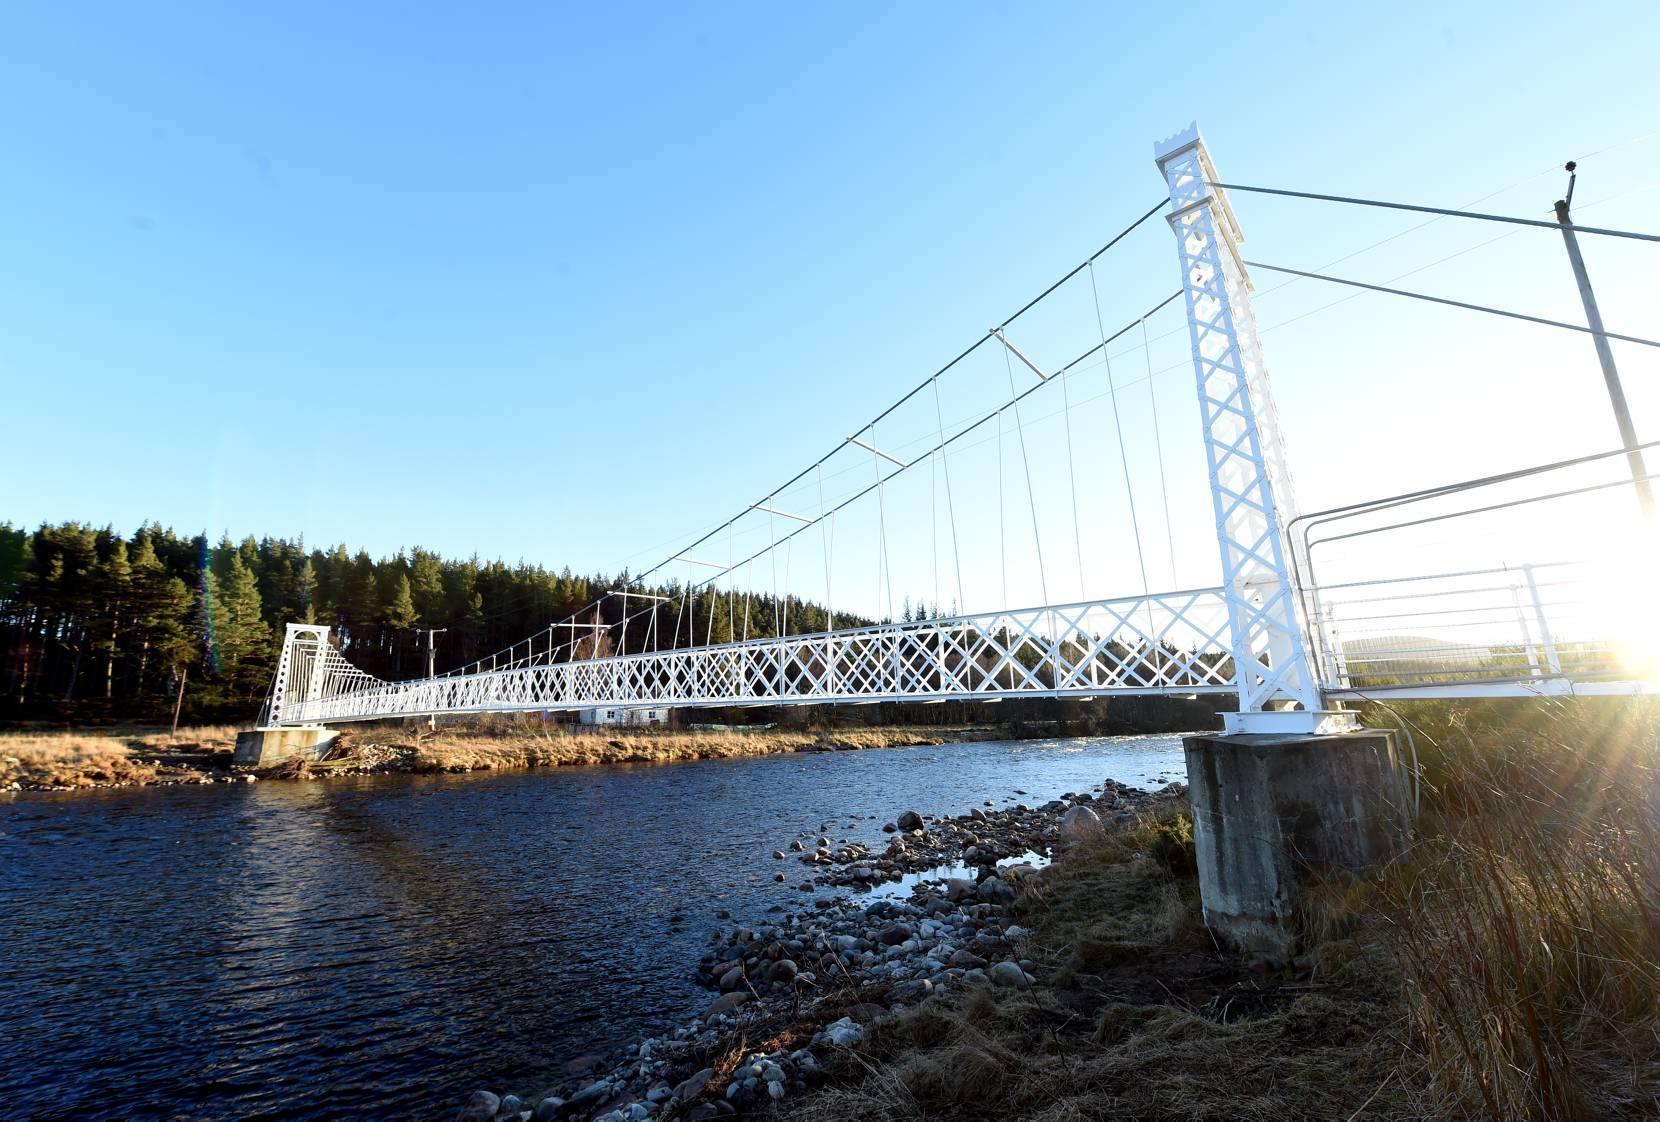 Polhollick footbridge at Bridge of Cairn, Ballater, as it looks now.